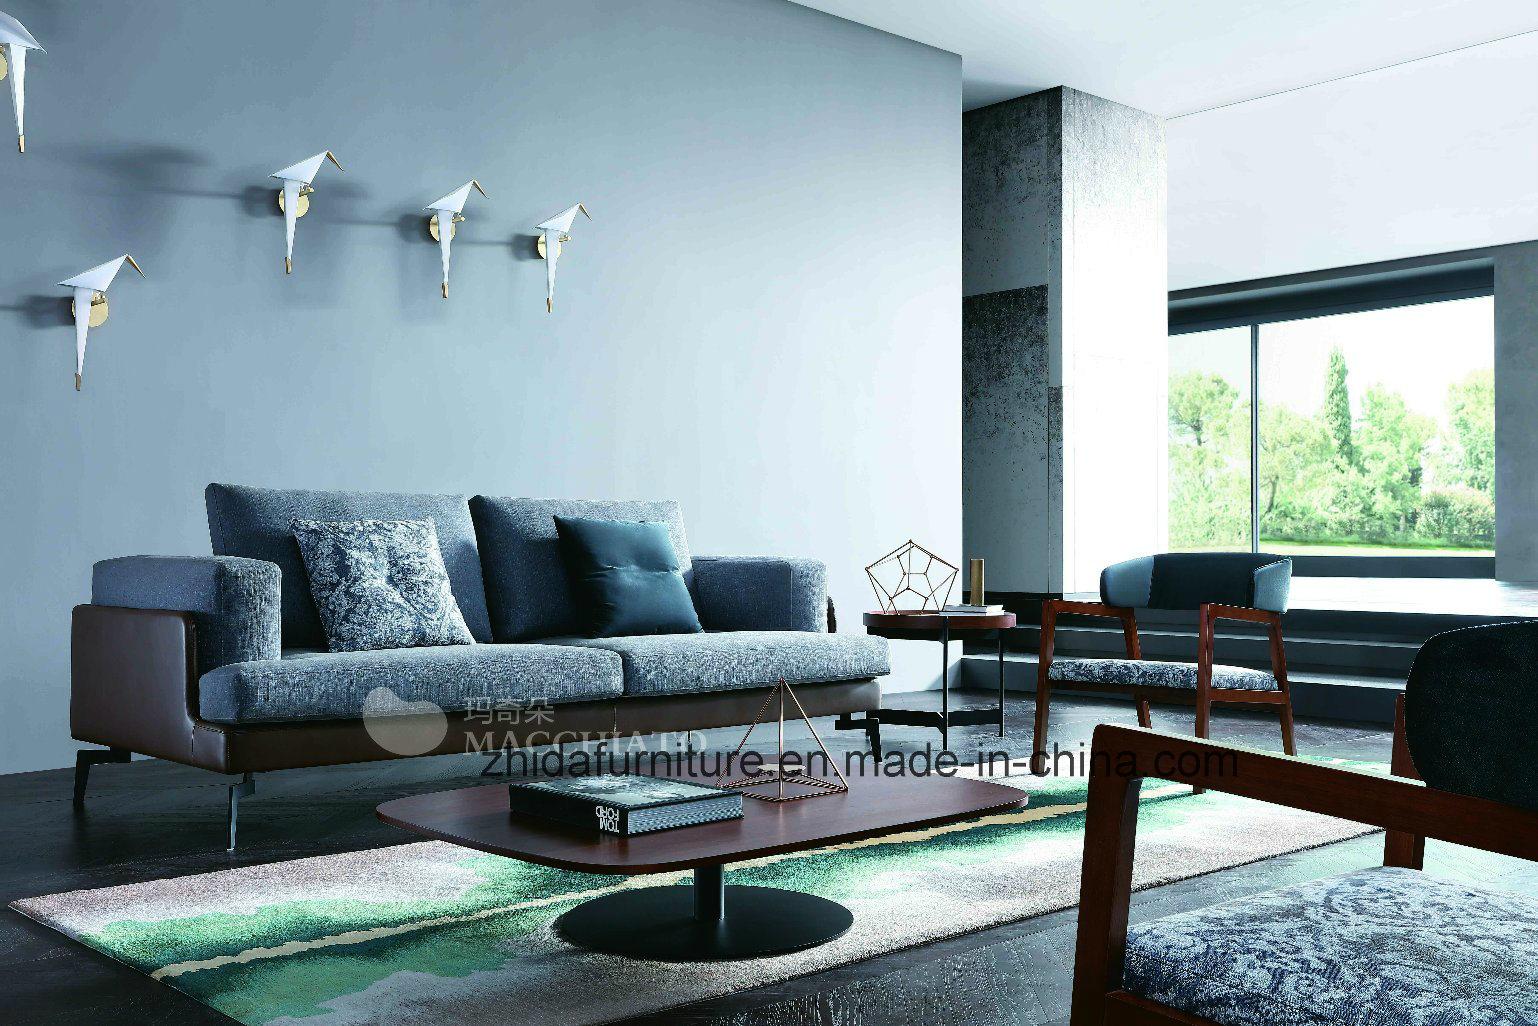 Leather Sofa Modern Design | Sofas Couches Scandinavian Designs